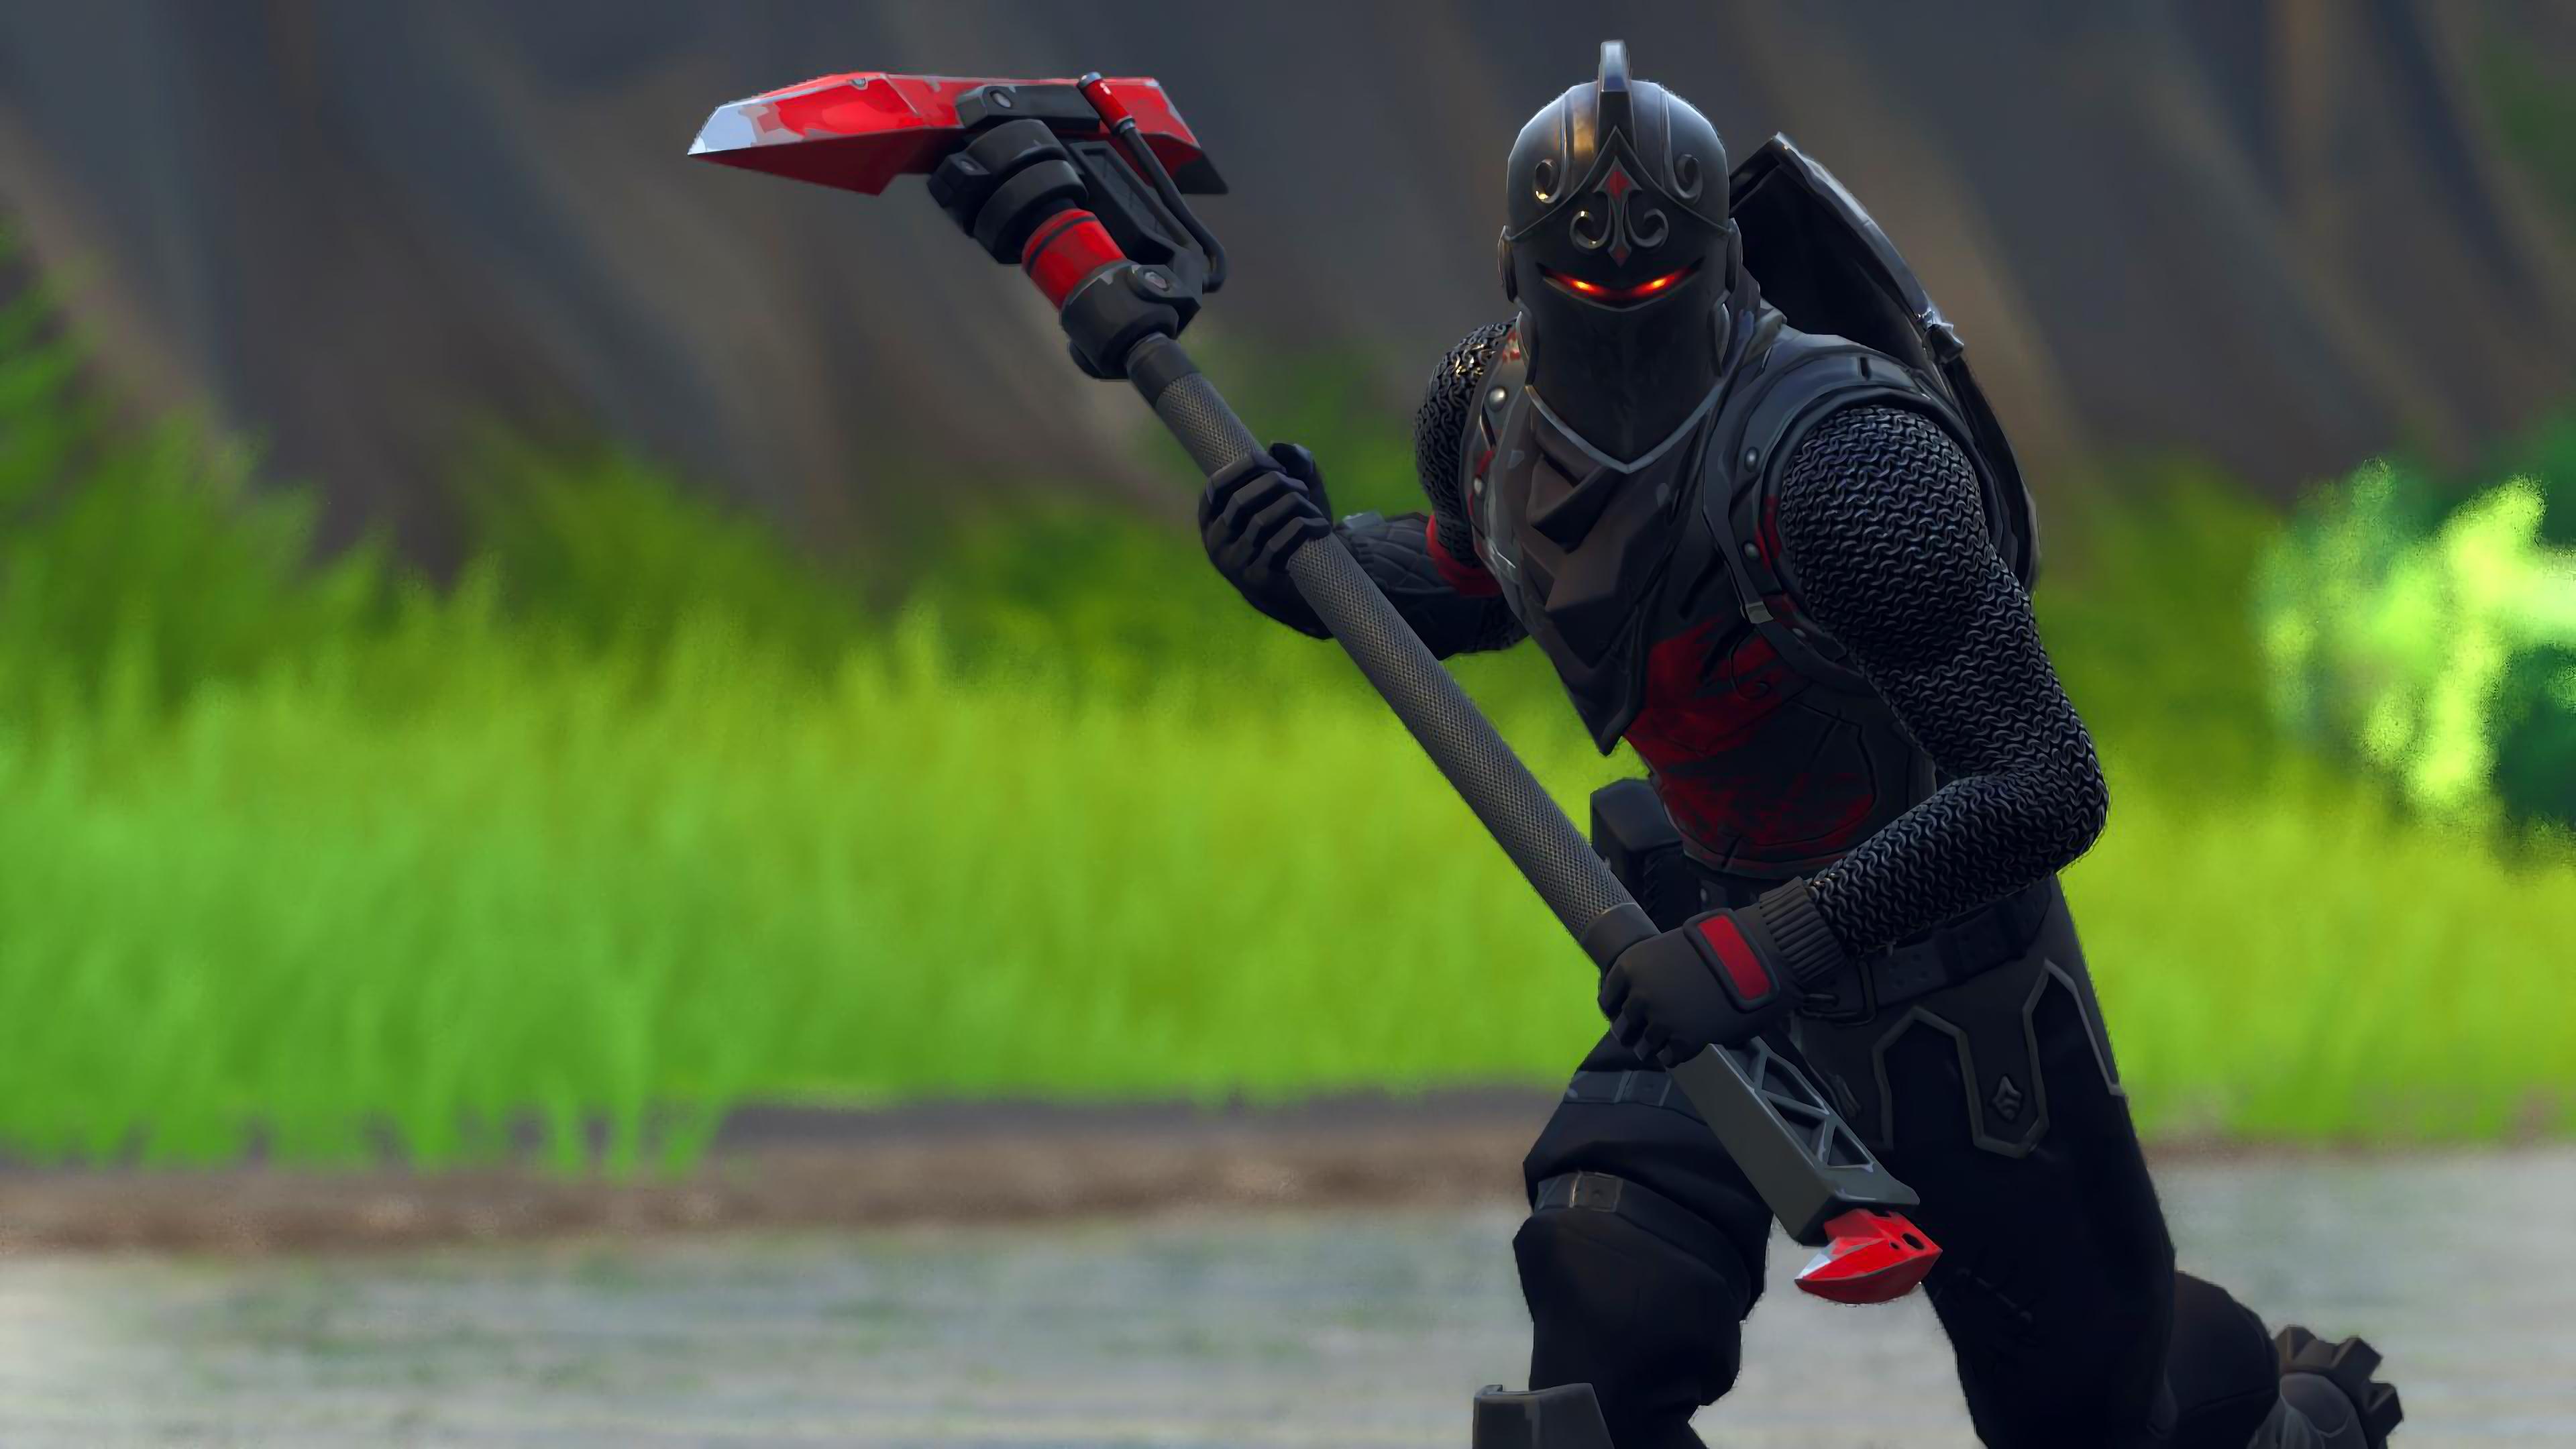 Black Knight Fortnite Battle Royale 4K 14008 3840x2160